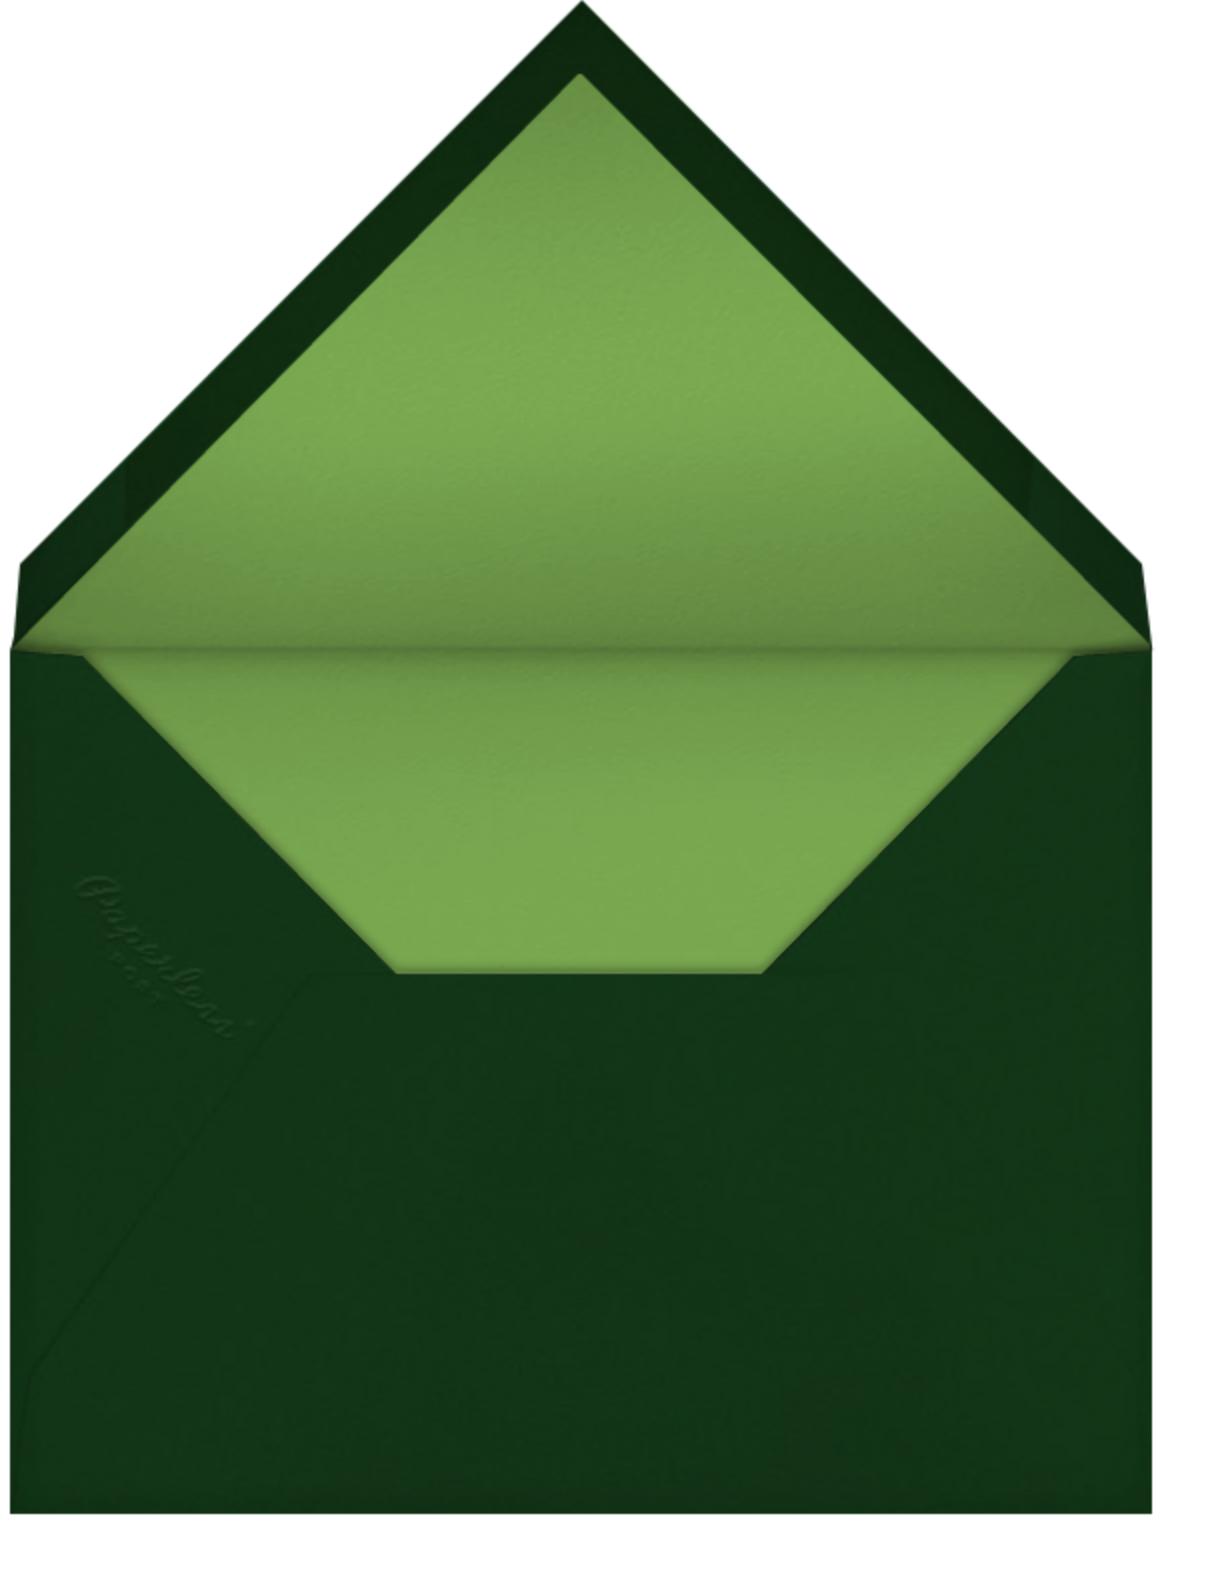 Fern II (Invitation) - Green - Paperless Post - Housewarming - envelope back